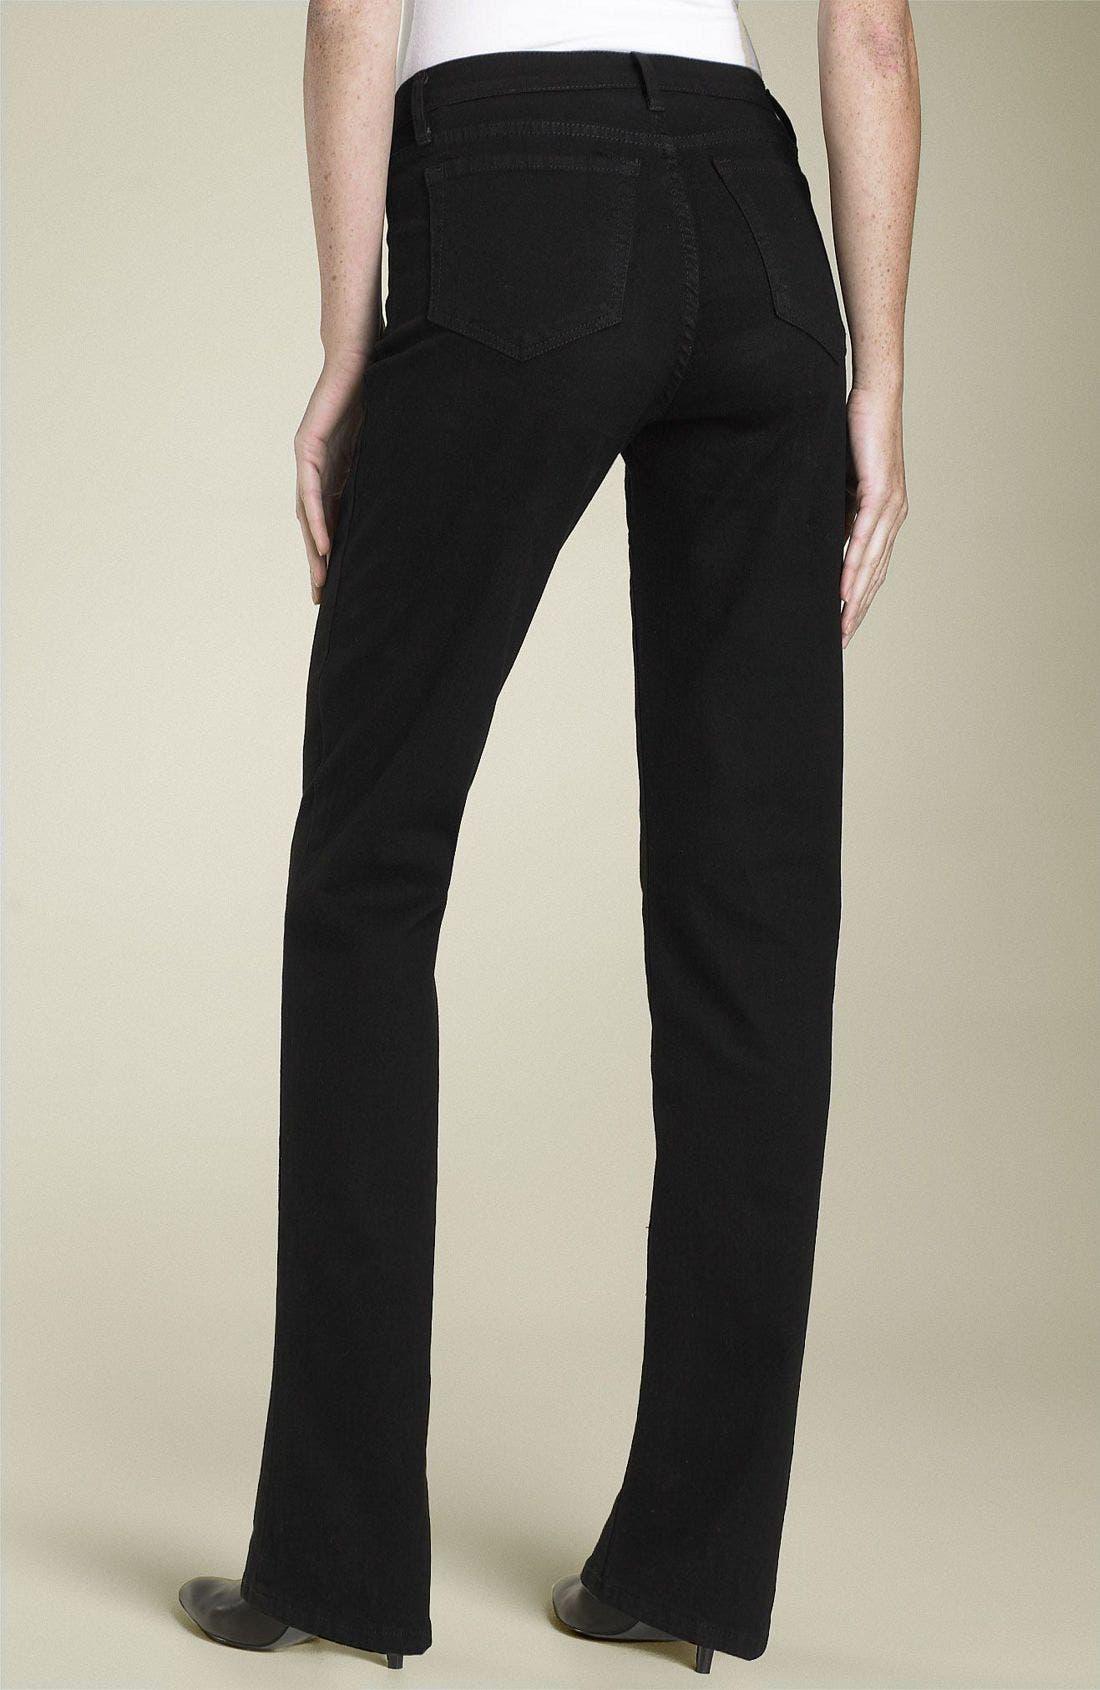 Alternate Image 1 Selected - NYDJ Stretch Straight Leg Jeans (Petite)